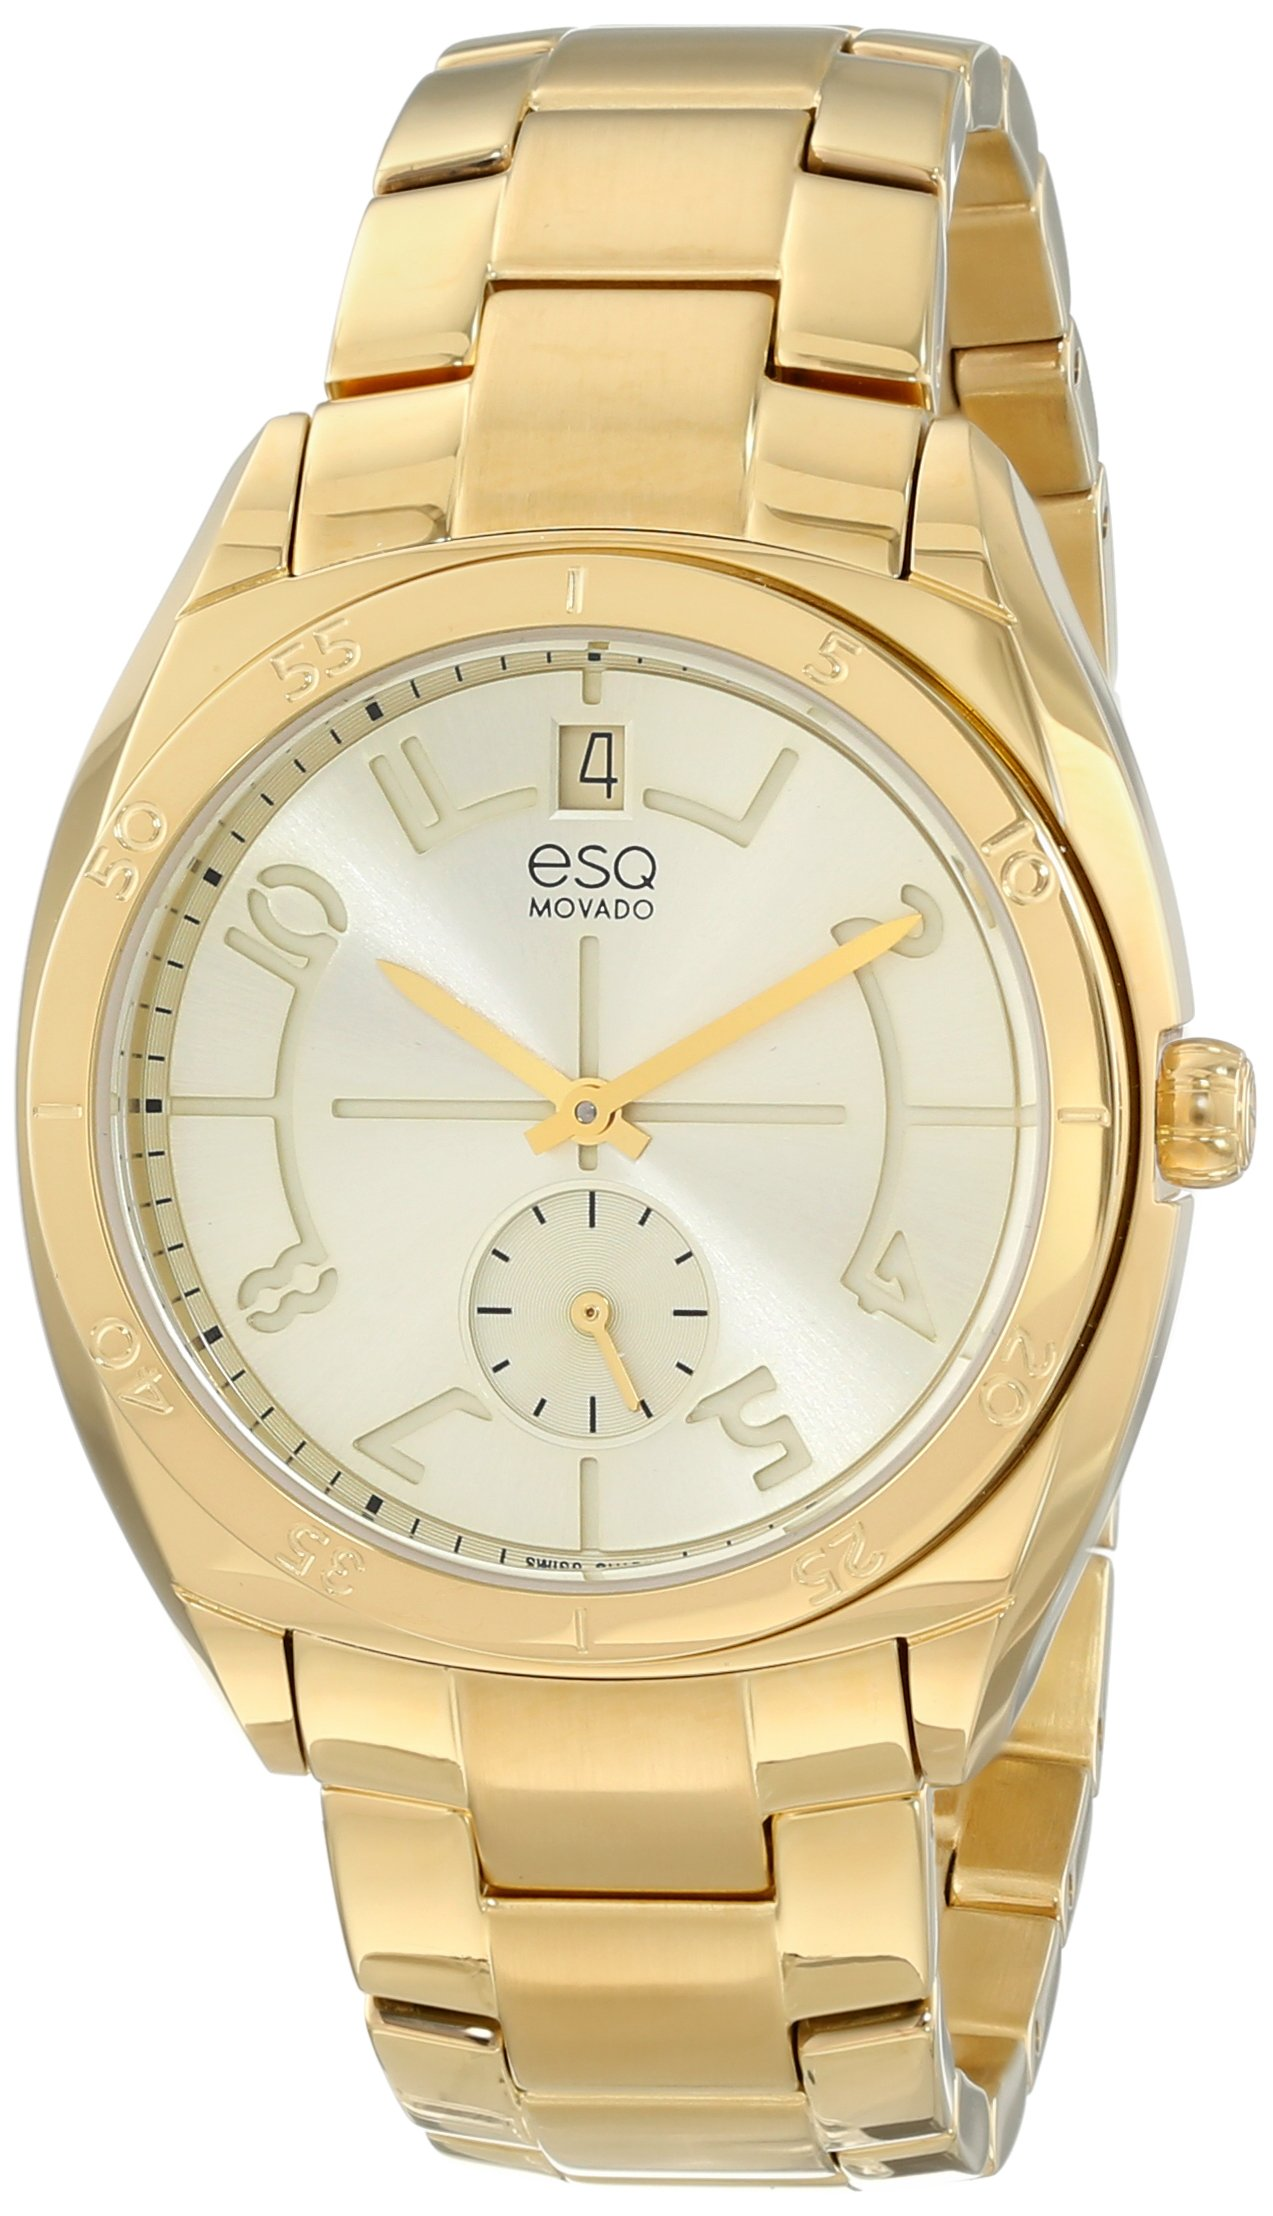 ESQ Movado Women's 07101401 esq ORIGIN Tonneau-Shaped Gold-Plated Watch